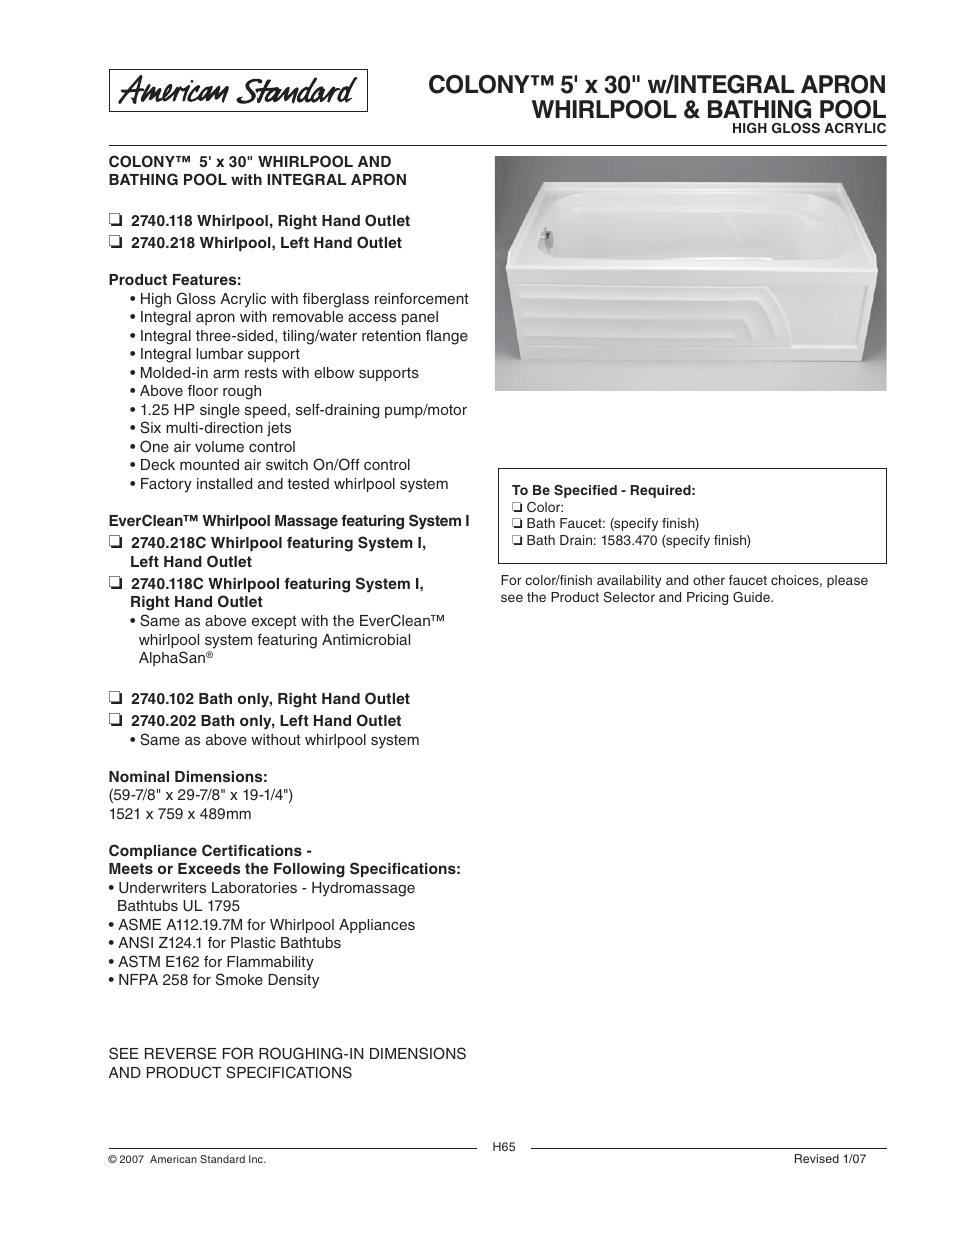 american standard colony 2740 118c user manual 2 pages rh manualsdir com Running Man E162 Radiant Panel Class 1